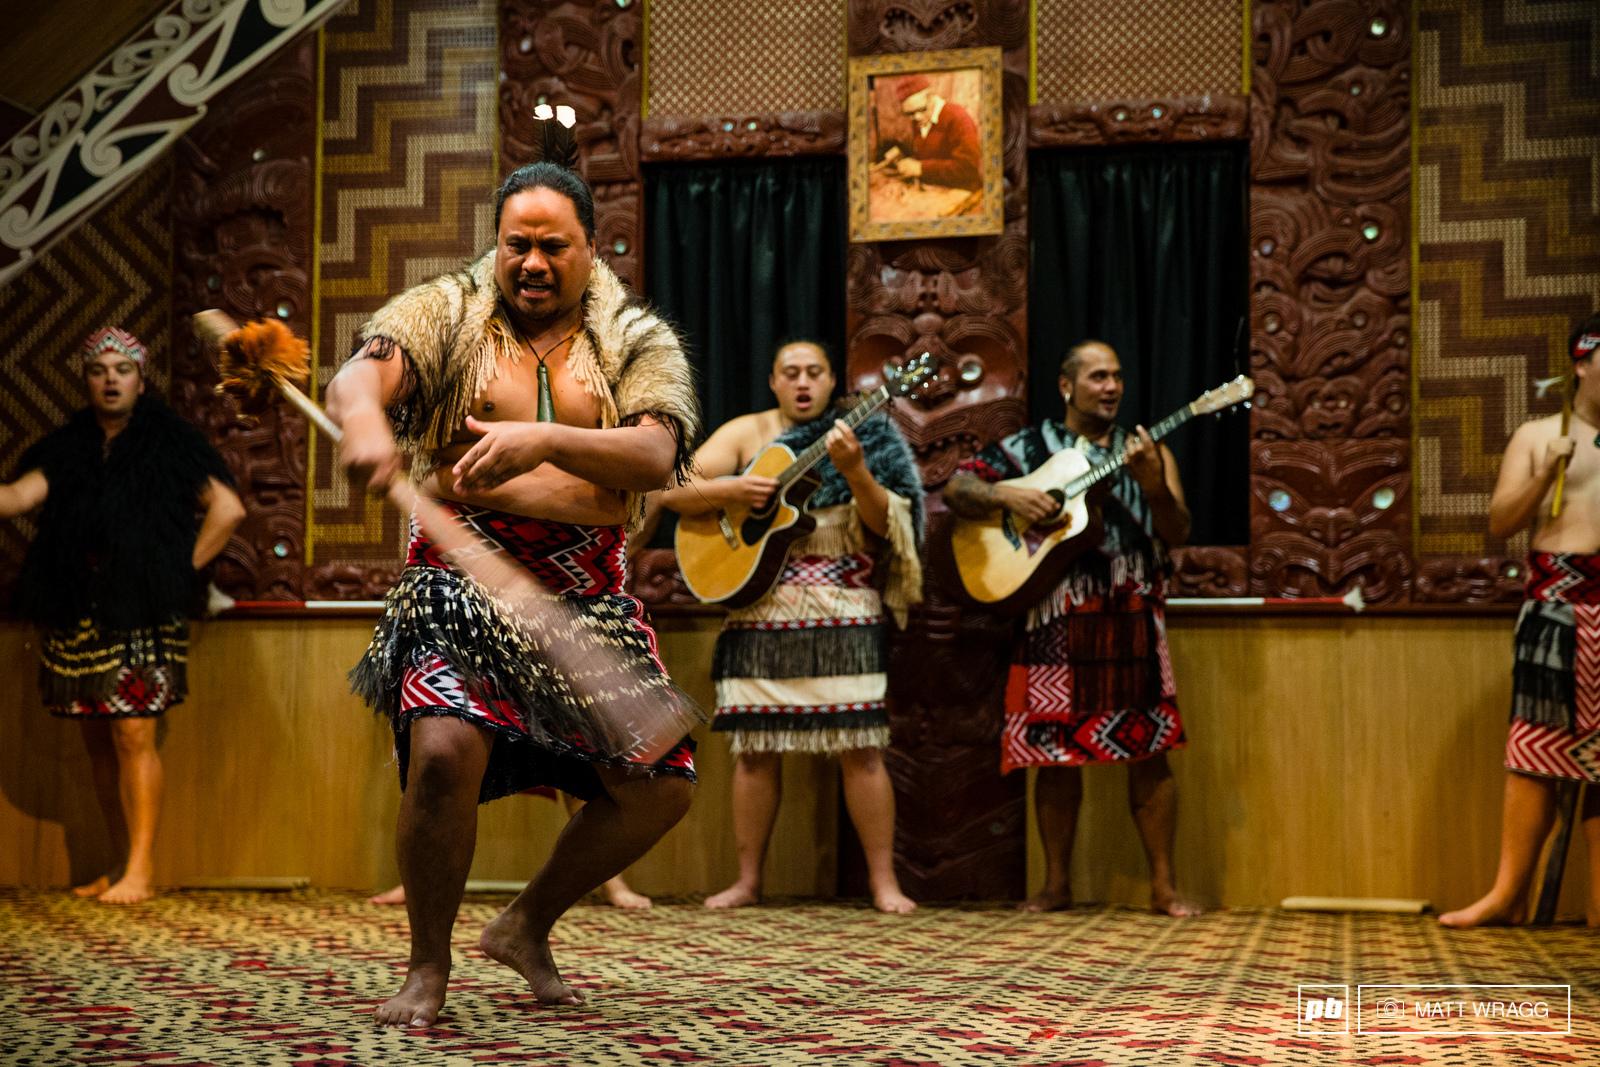 Maori dance during opening ceremony at Te Puia. EWS 1 2015 Rotorua New Zealand. Photo by Matt Wreagg.